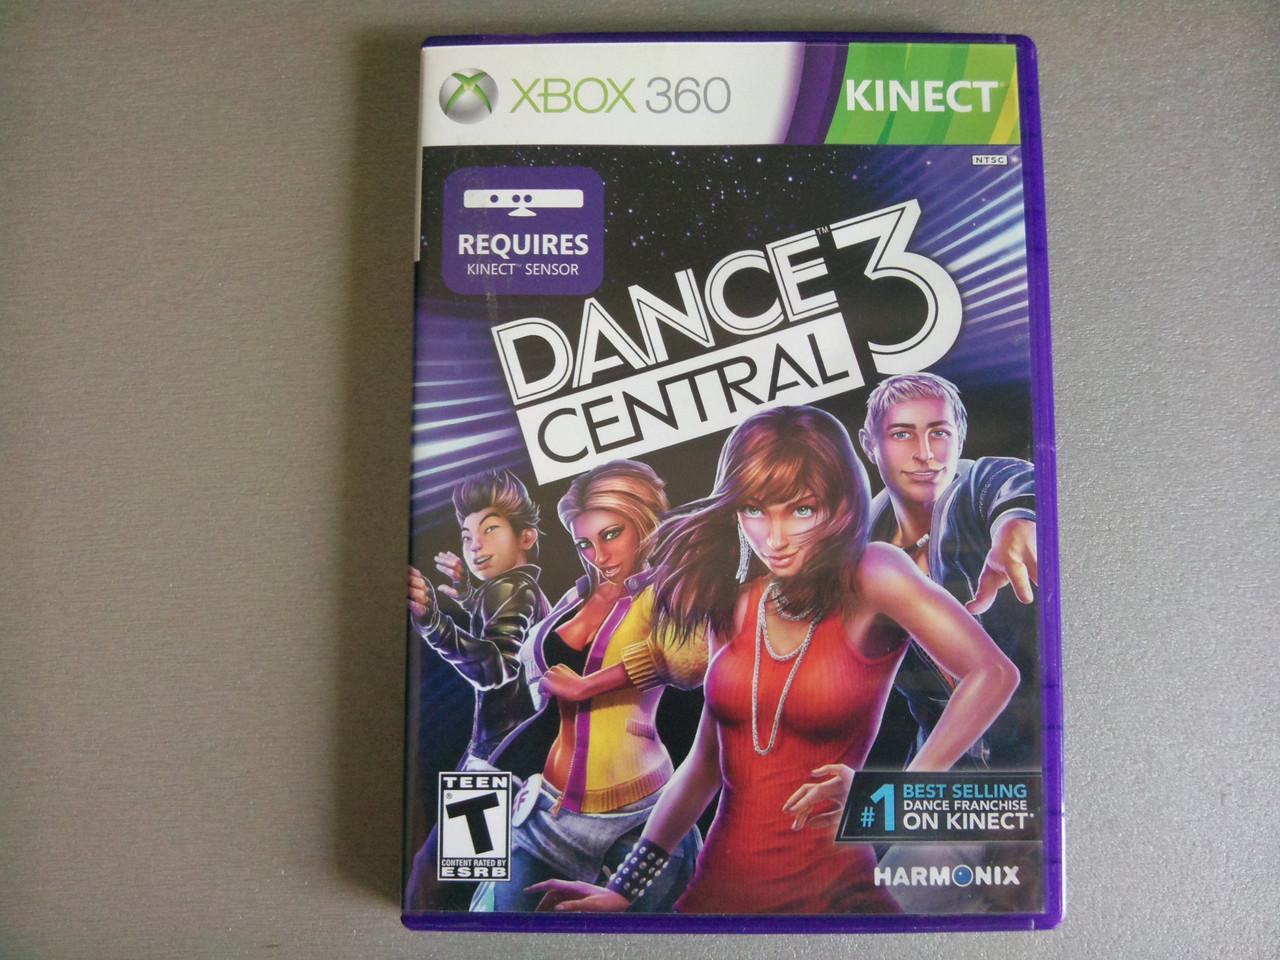 Игра xbox 360 Kinect Dance Central 3 регион NTSC - USmag в Черновцах